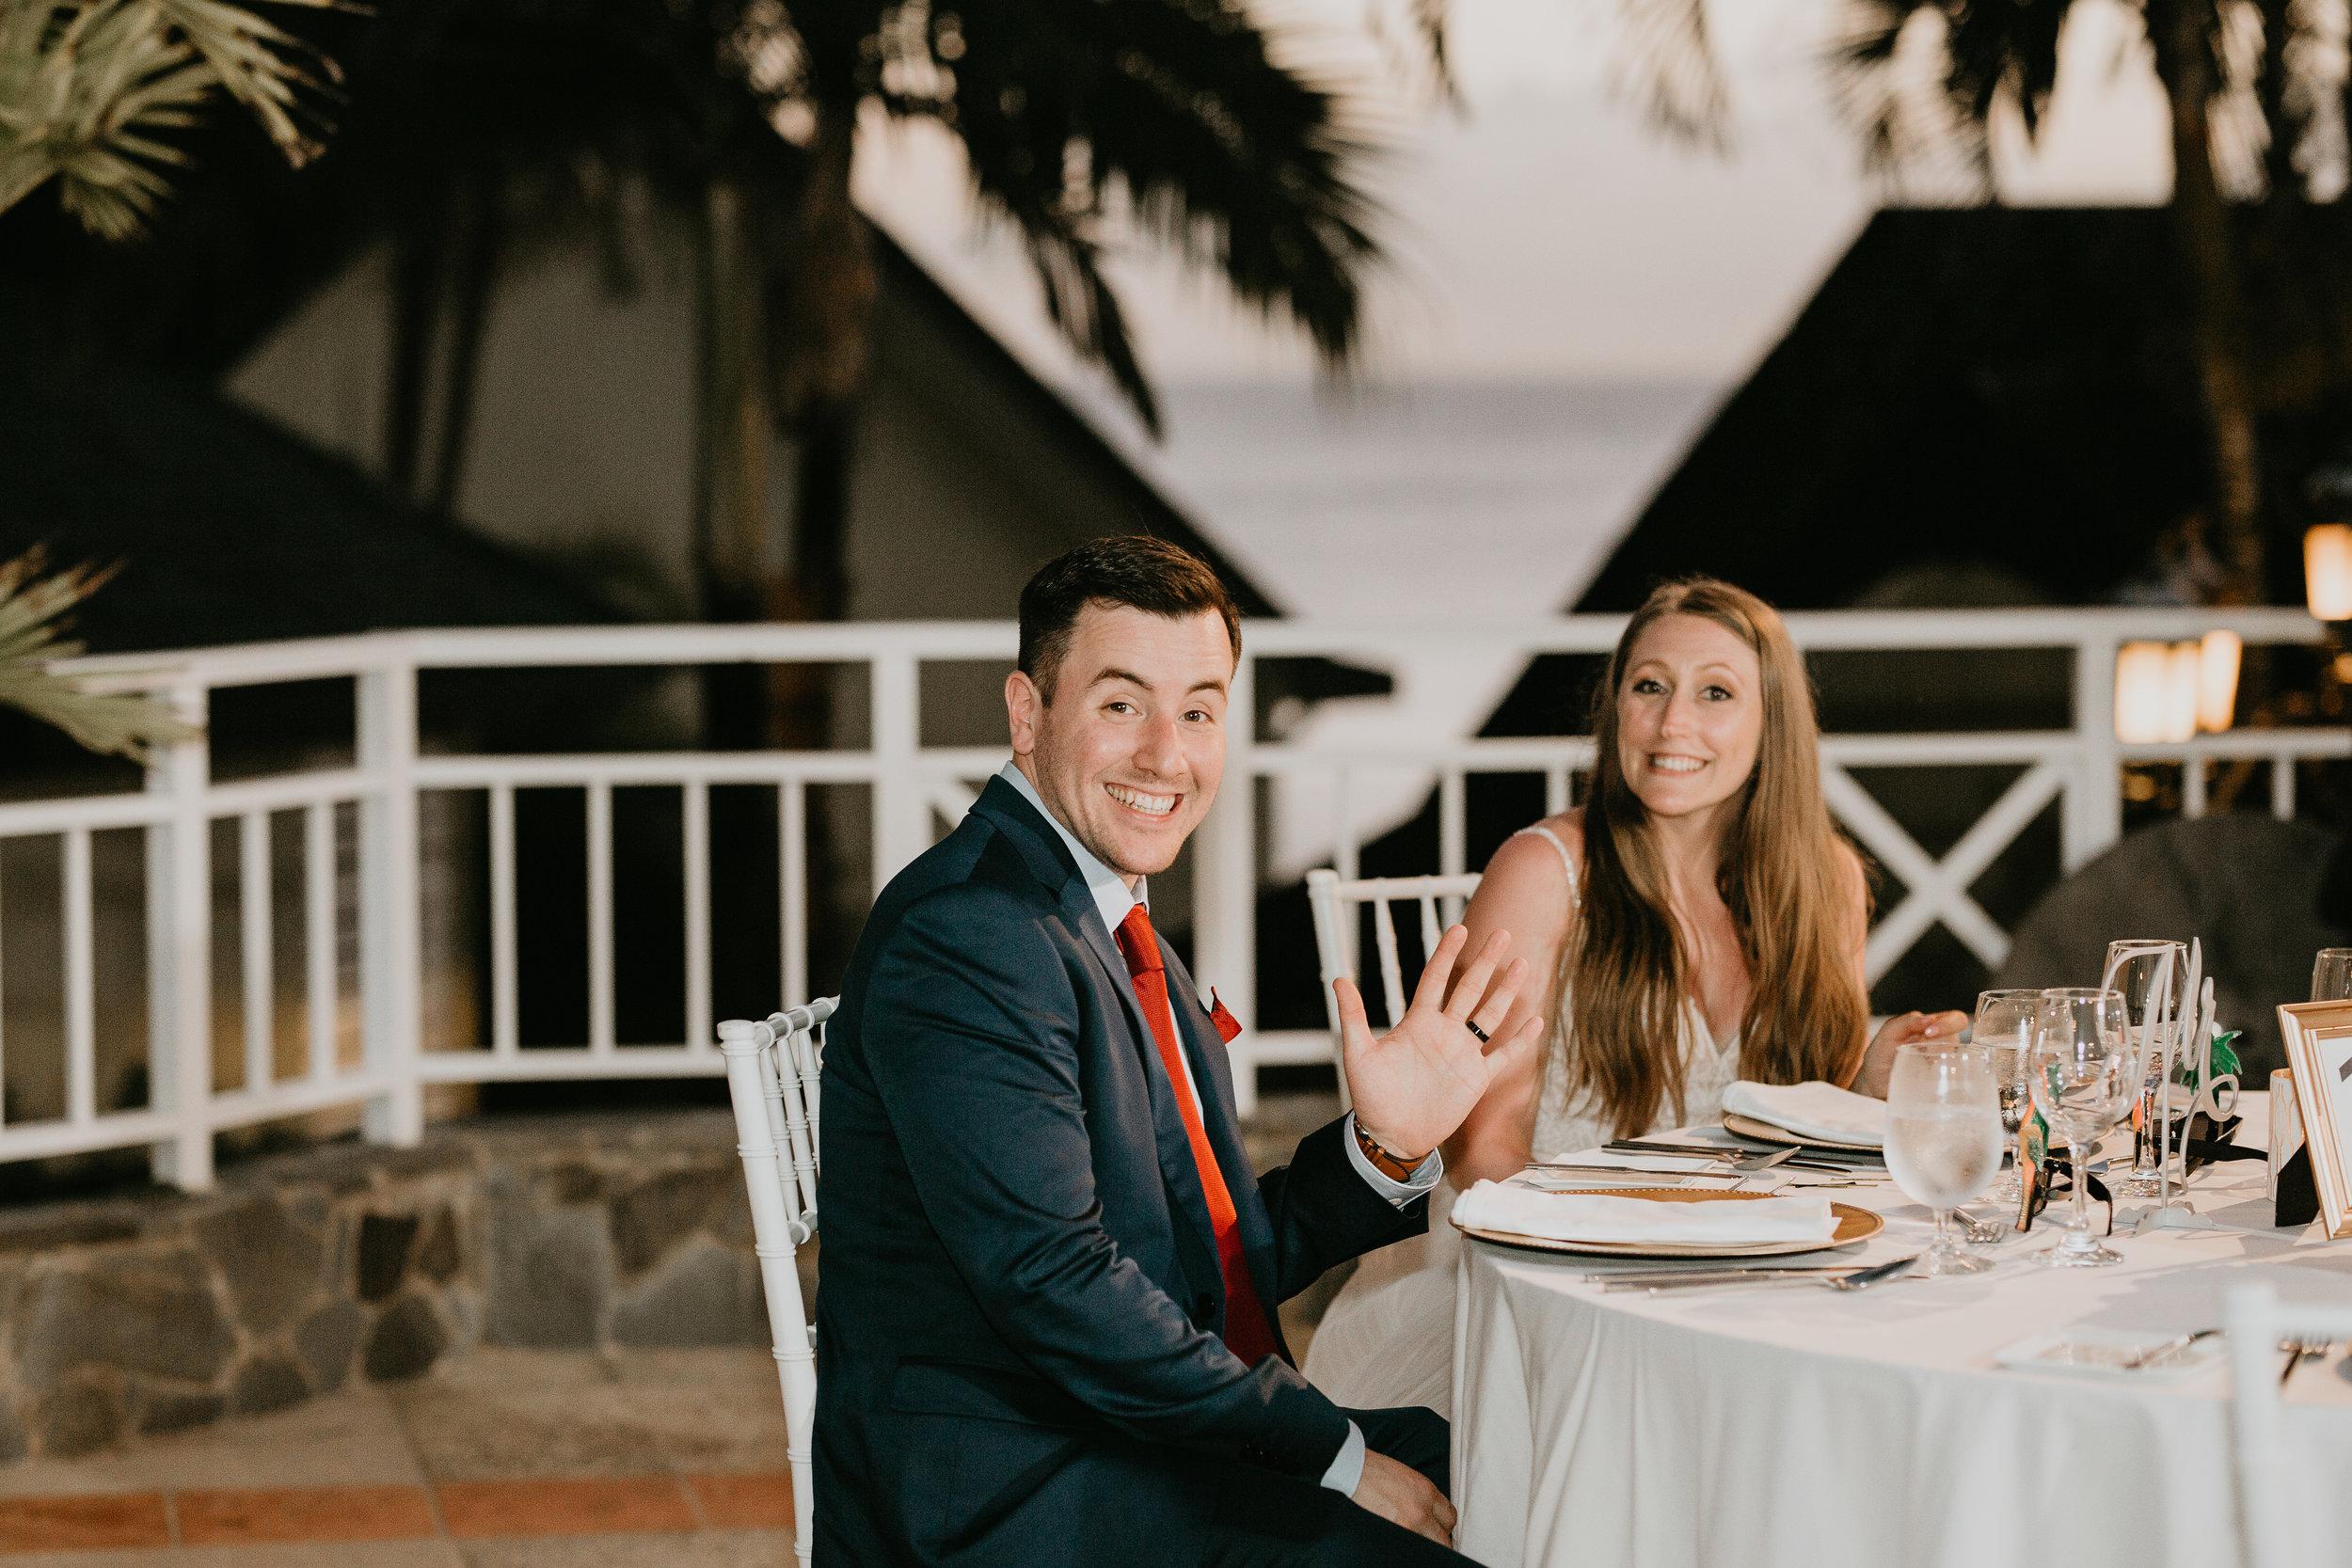 nicole-daacke-photography-destination-wedding-in-st-lucia-sandals-la-toc-intimate-island-wedding-carribean-elopement-photographer-chill-island-wedding-143.jpg